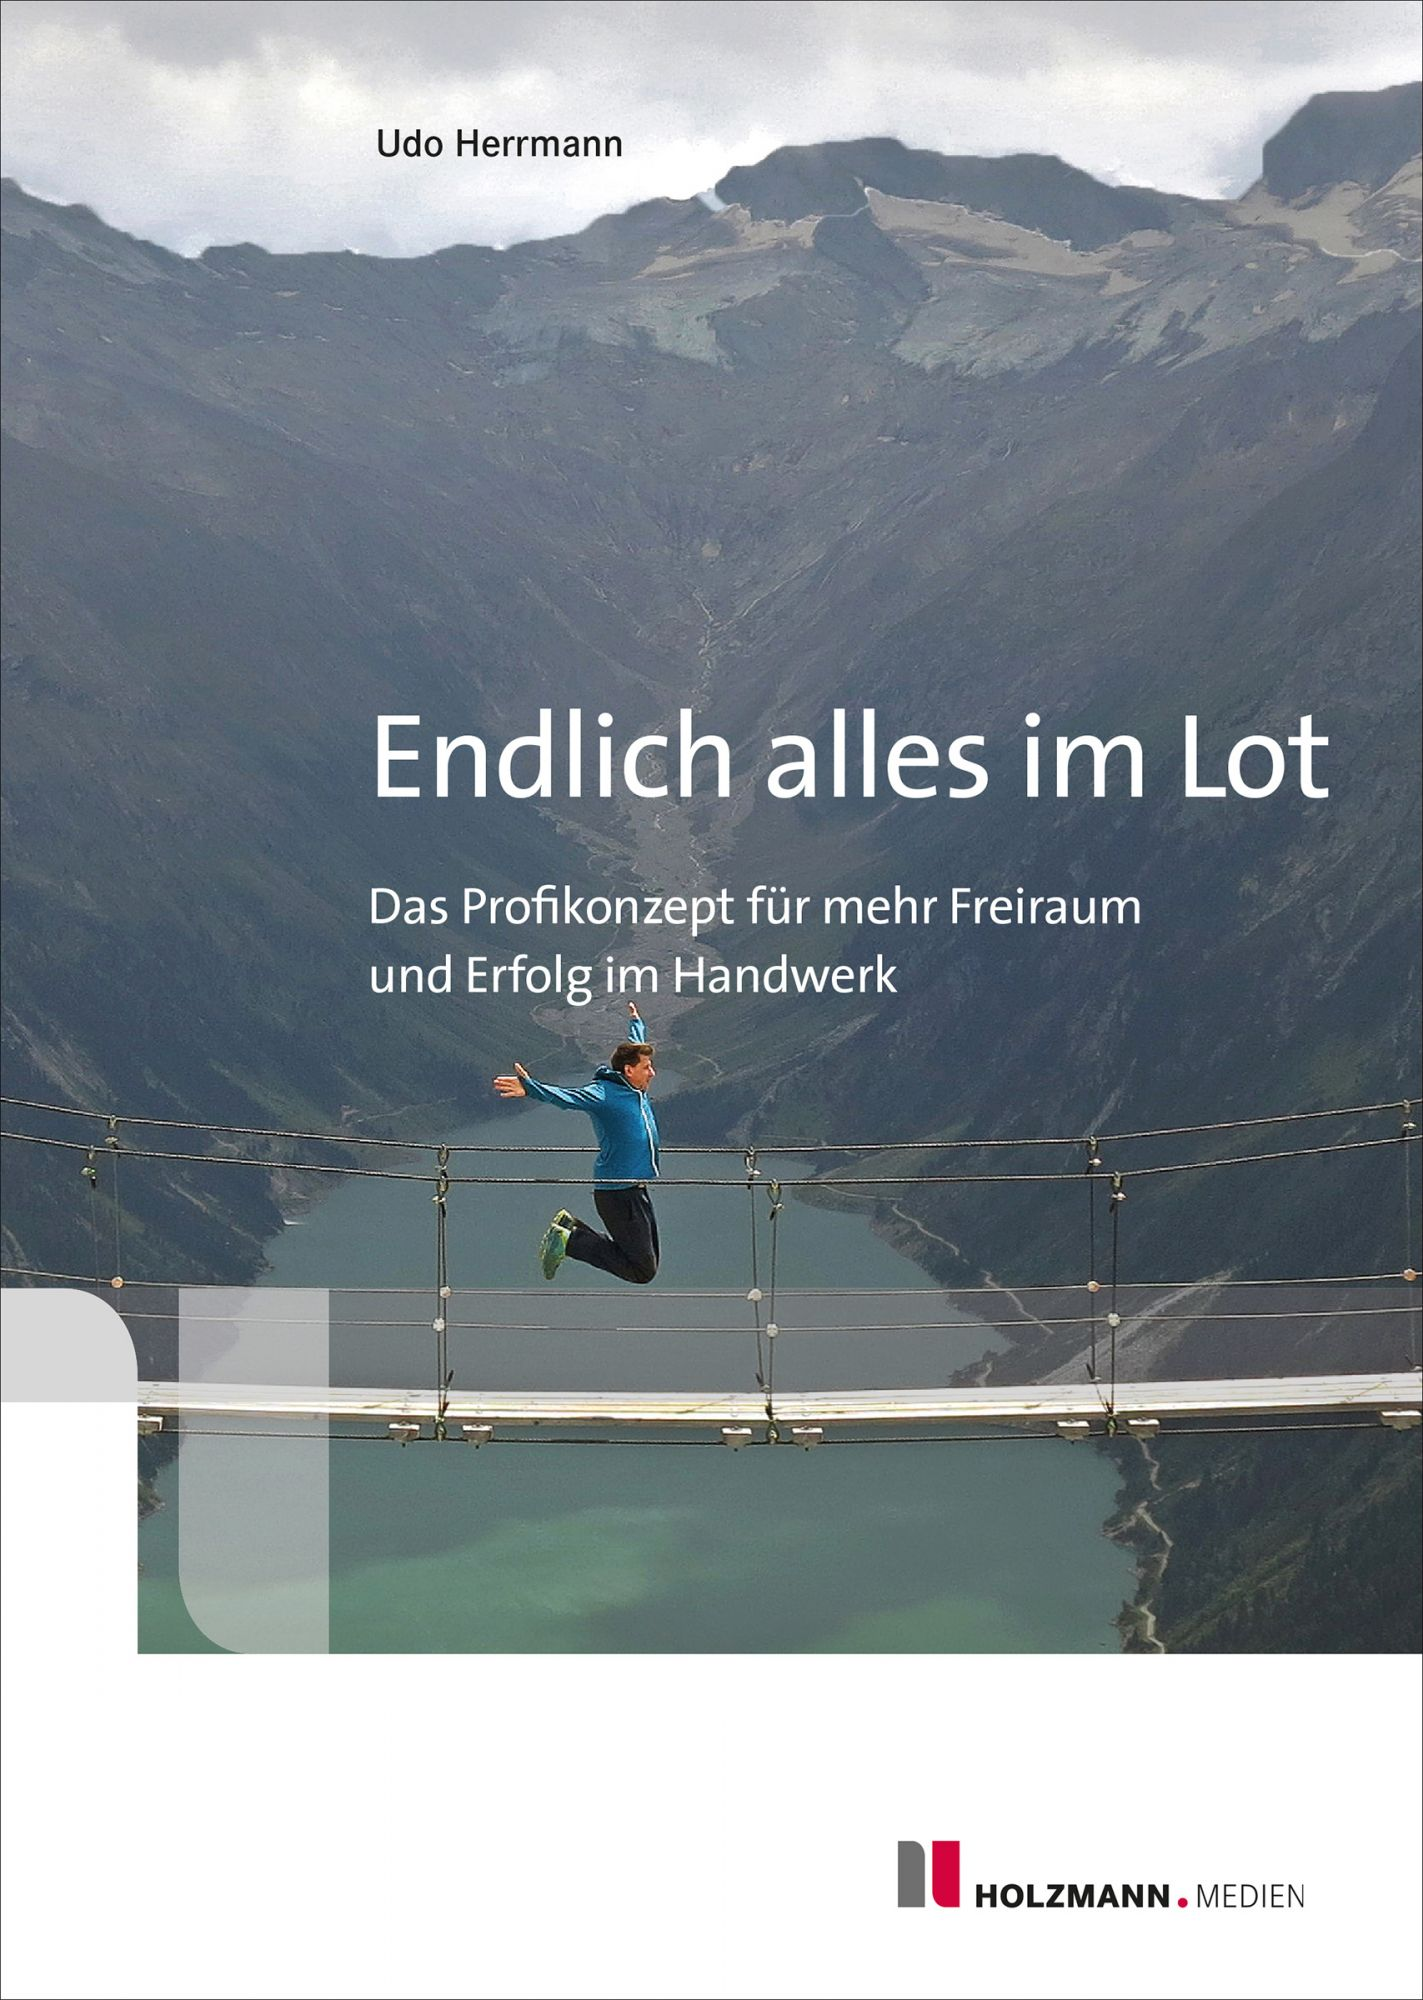 e-book-cover_endlich-alles-im-lot_udo-herrmann